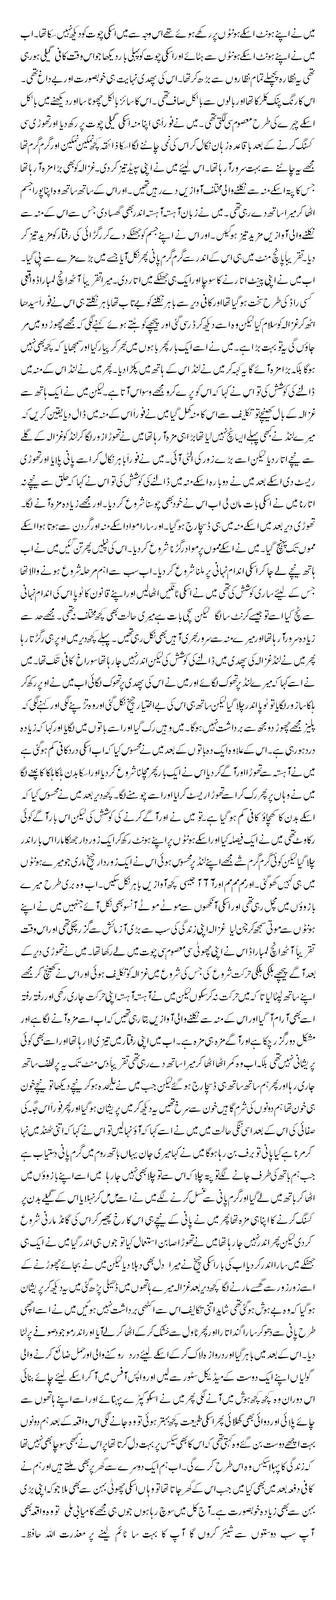 Free Urdu Sexy Stories - Wordpress Blog-1271